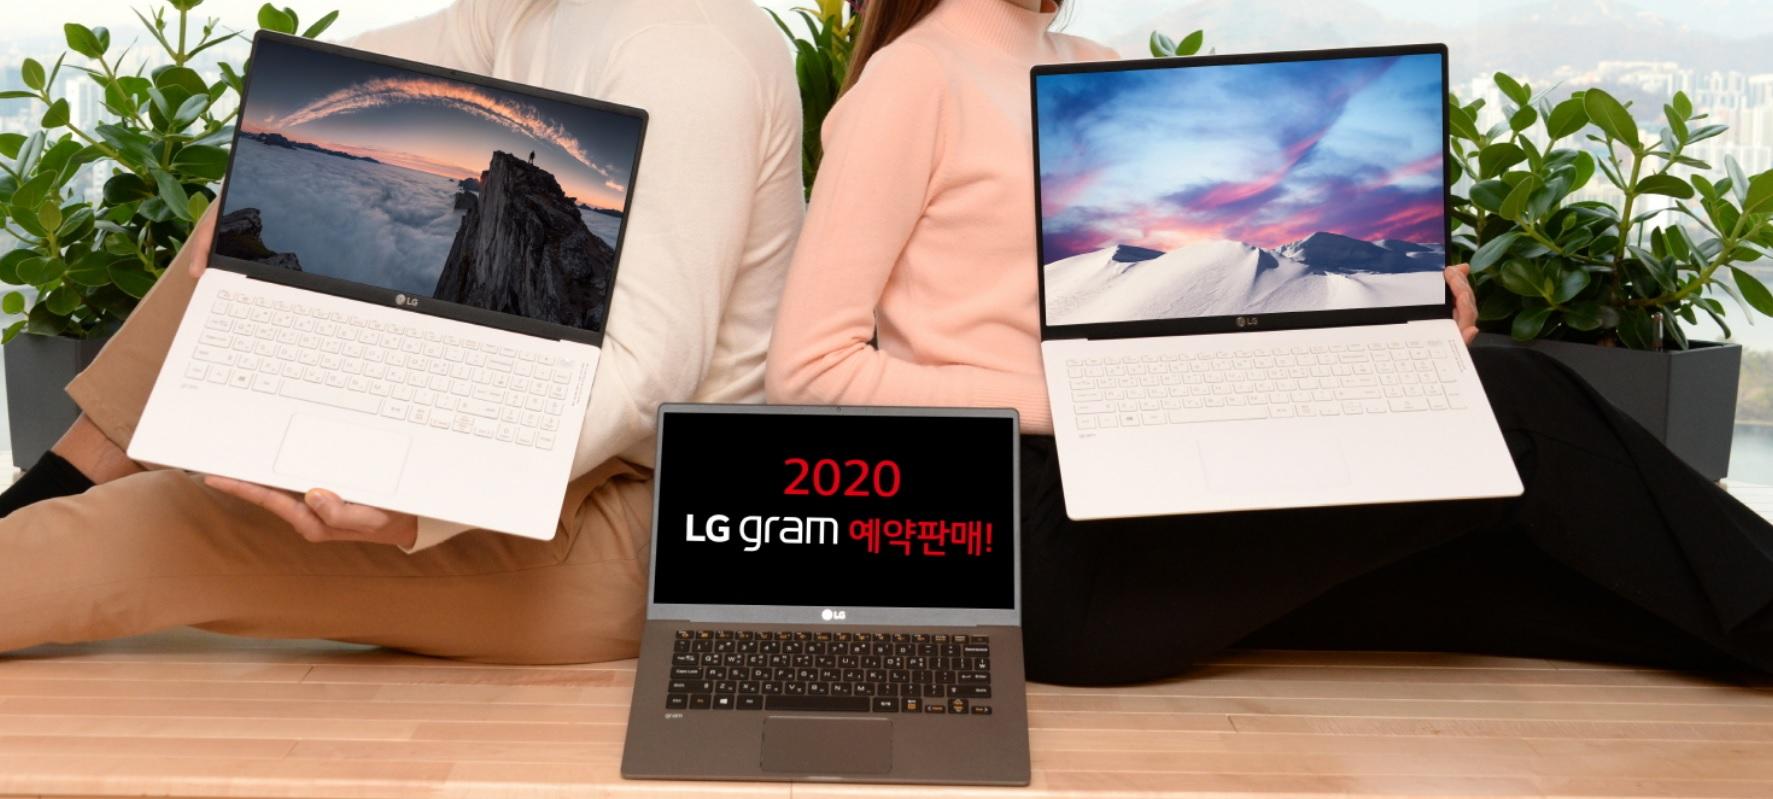 laptop LG Gram 2020